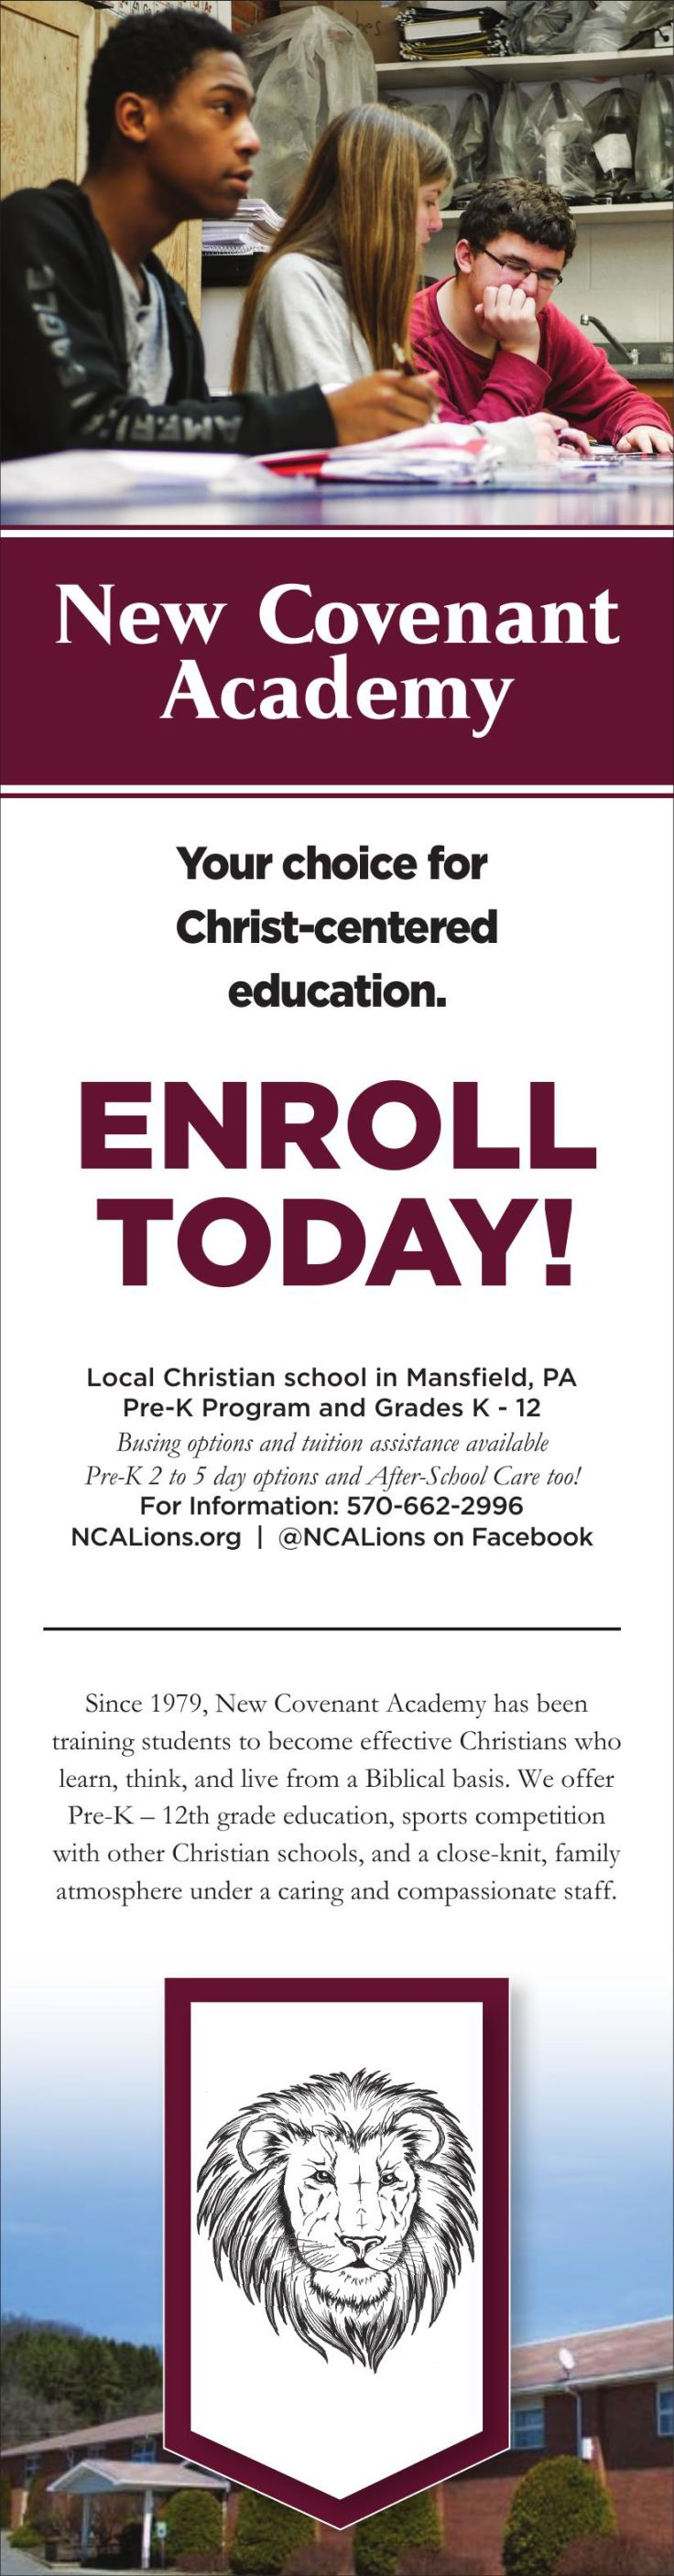 New Covenant Academy_Enrollment 3x21 ROP_3-28-19 pdf | Free Press